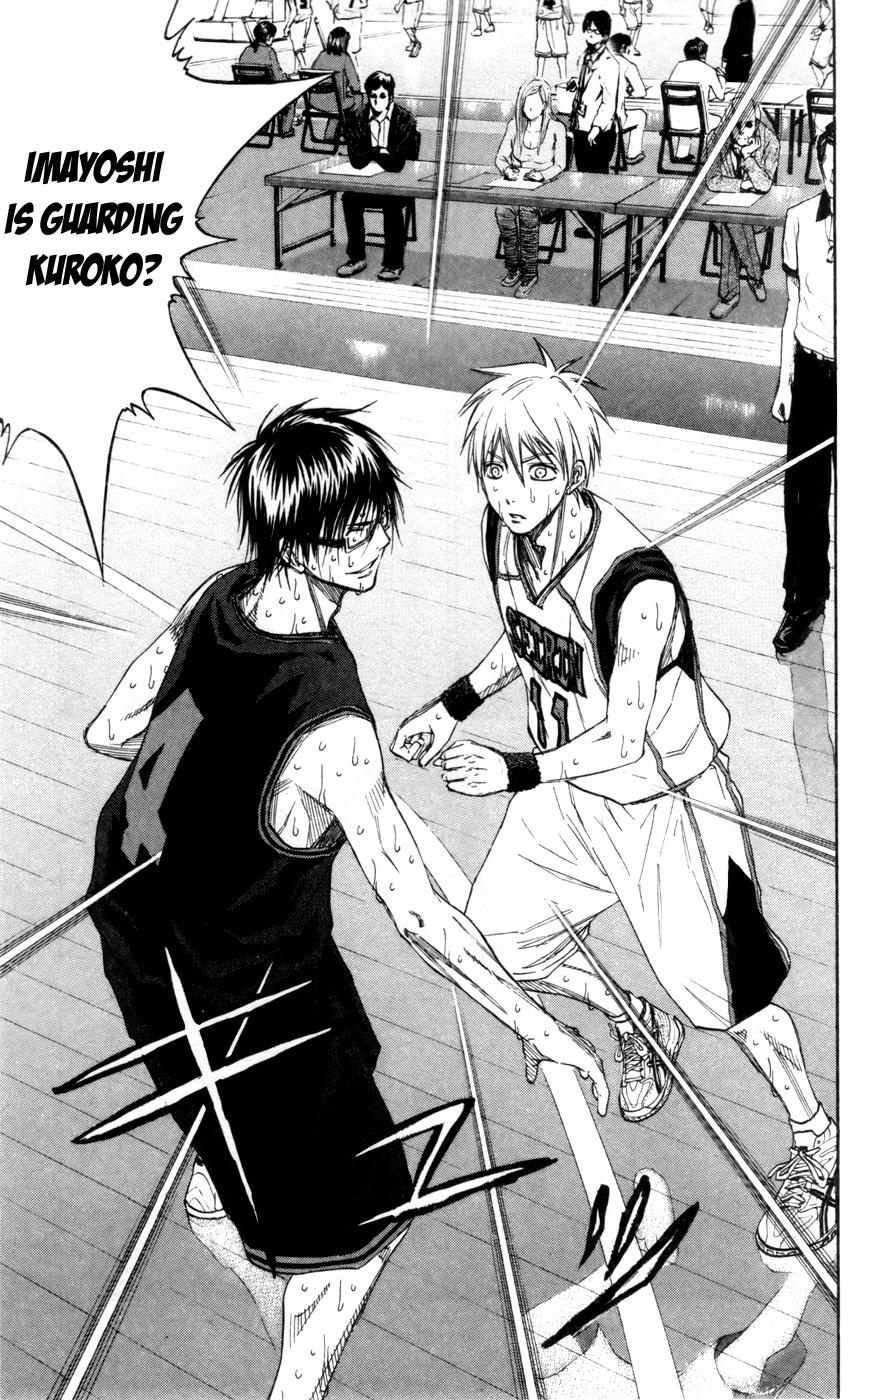 Kuroko no Basket Manga Chapter 126 - Image 07